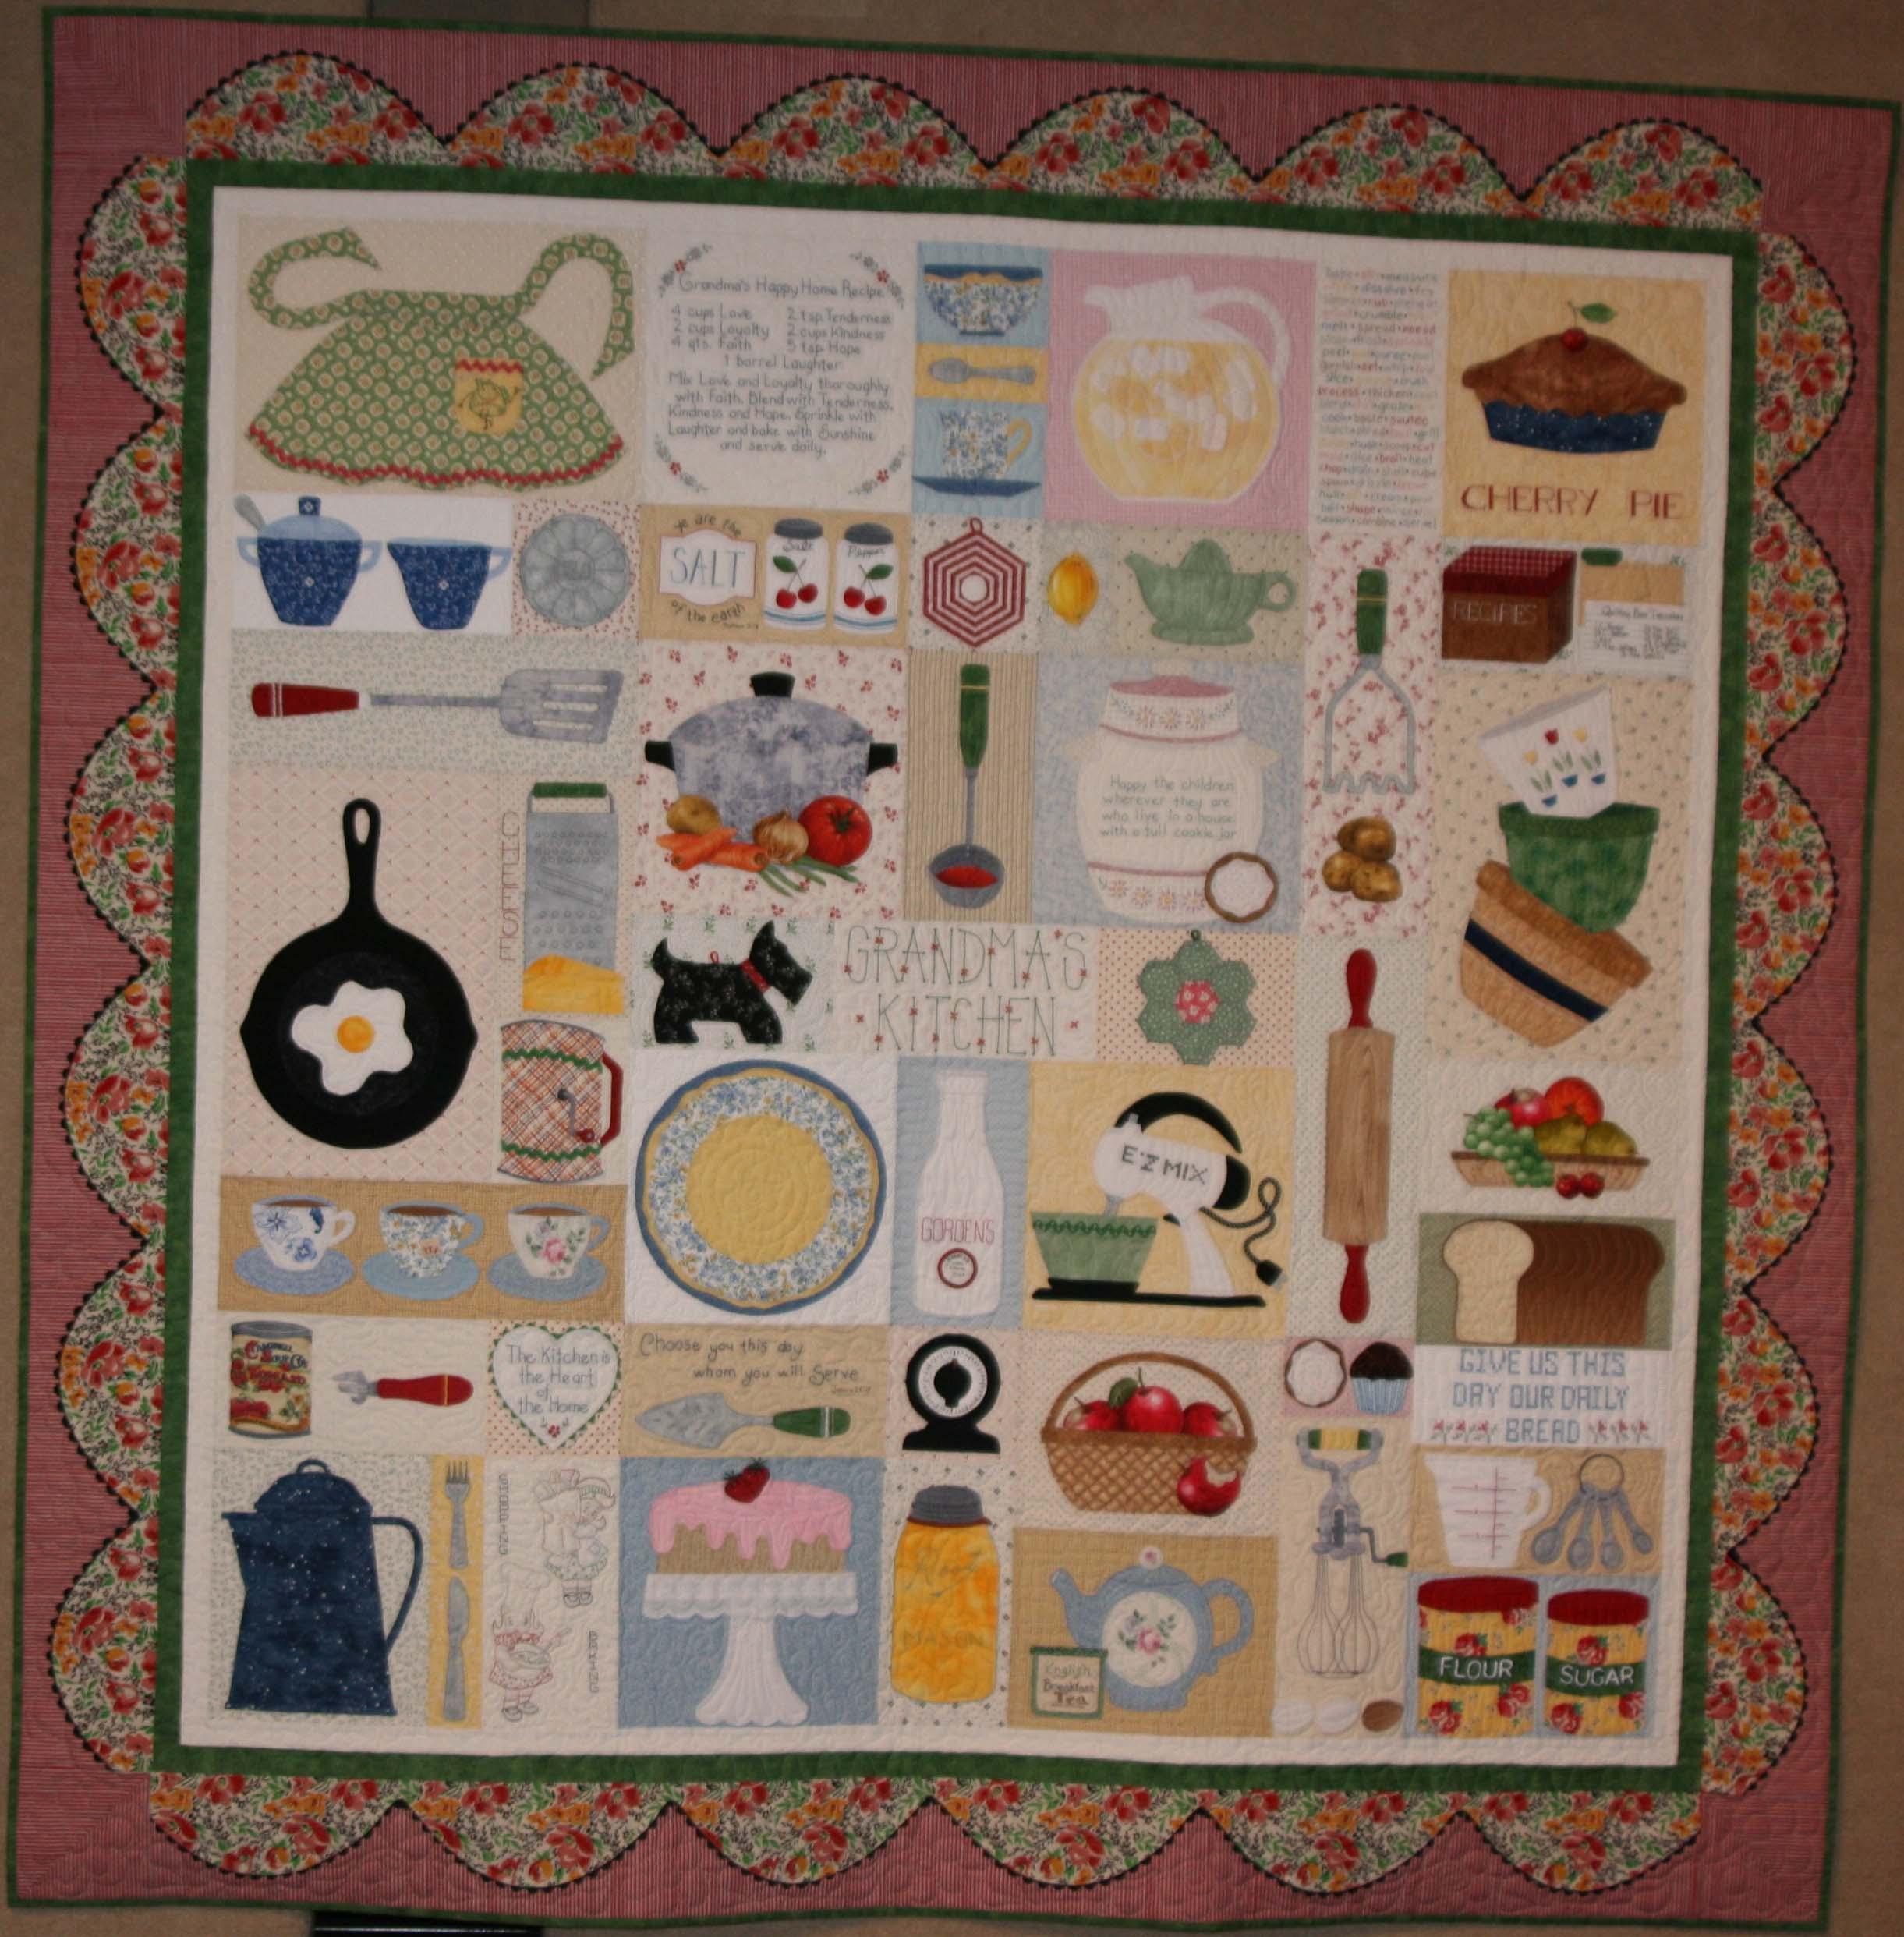 Grandma's kitchen quilt